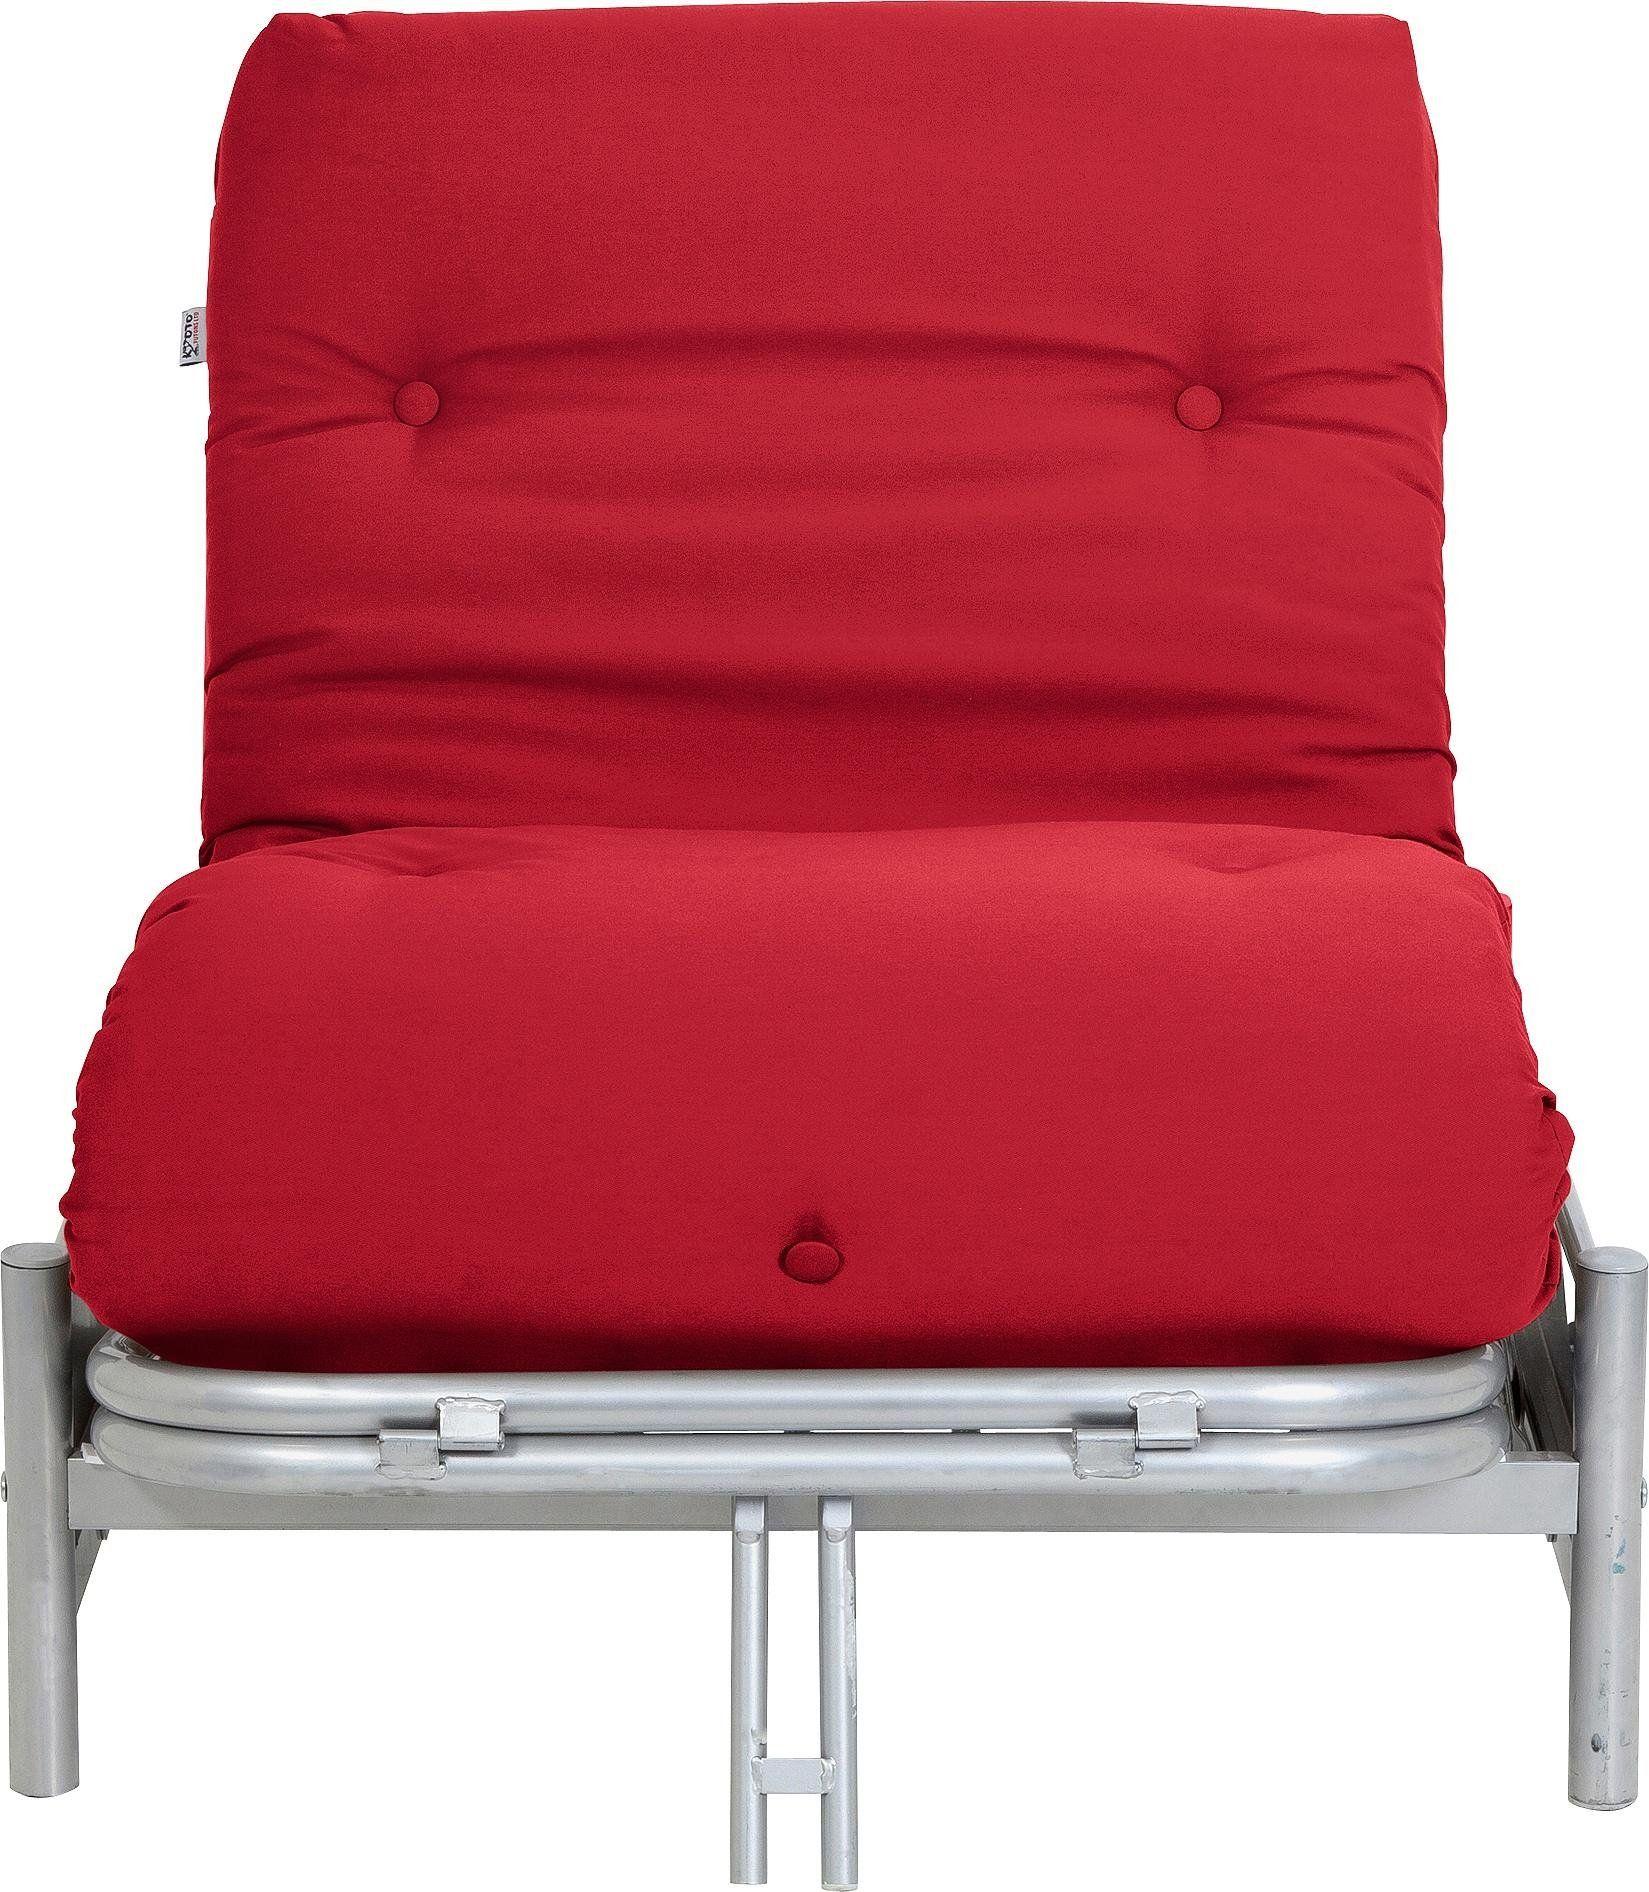 Argos Home Single Futon Metal Sofa Bed with Mattress Red